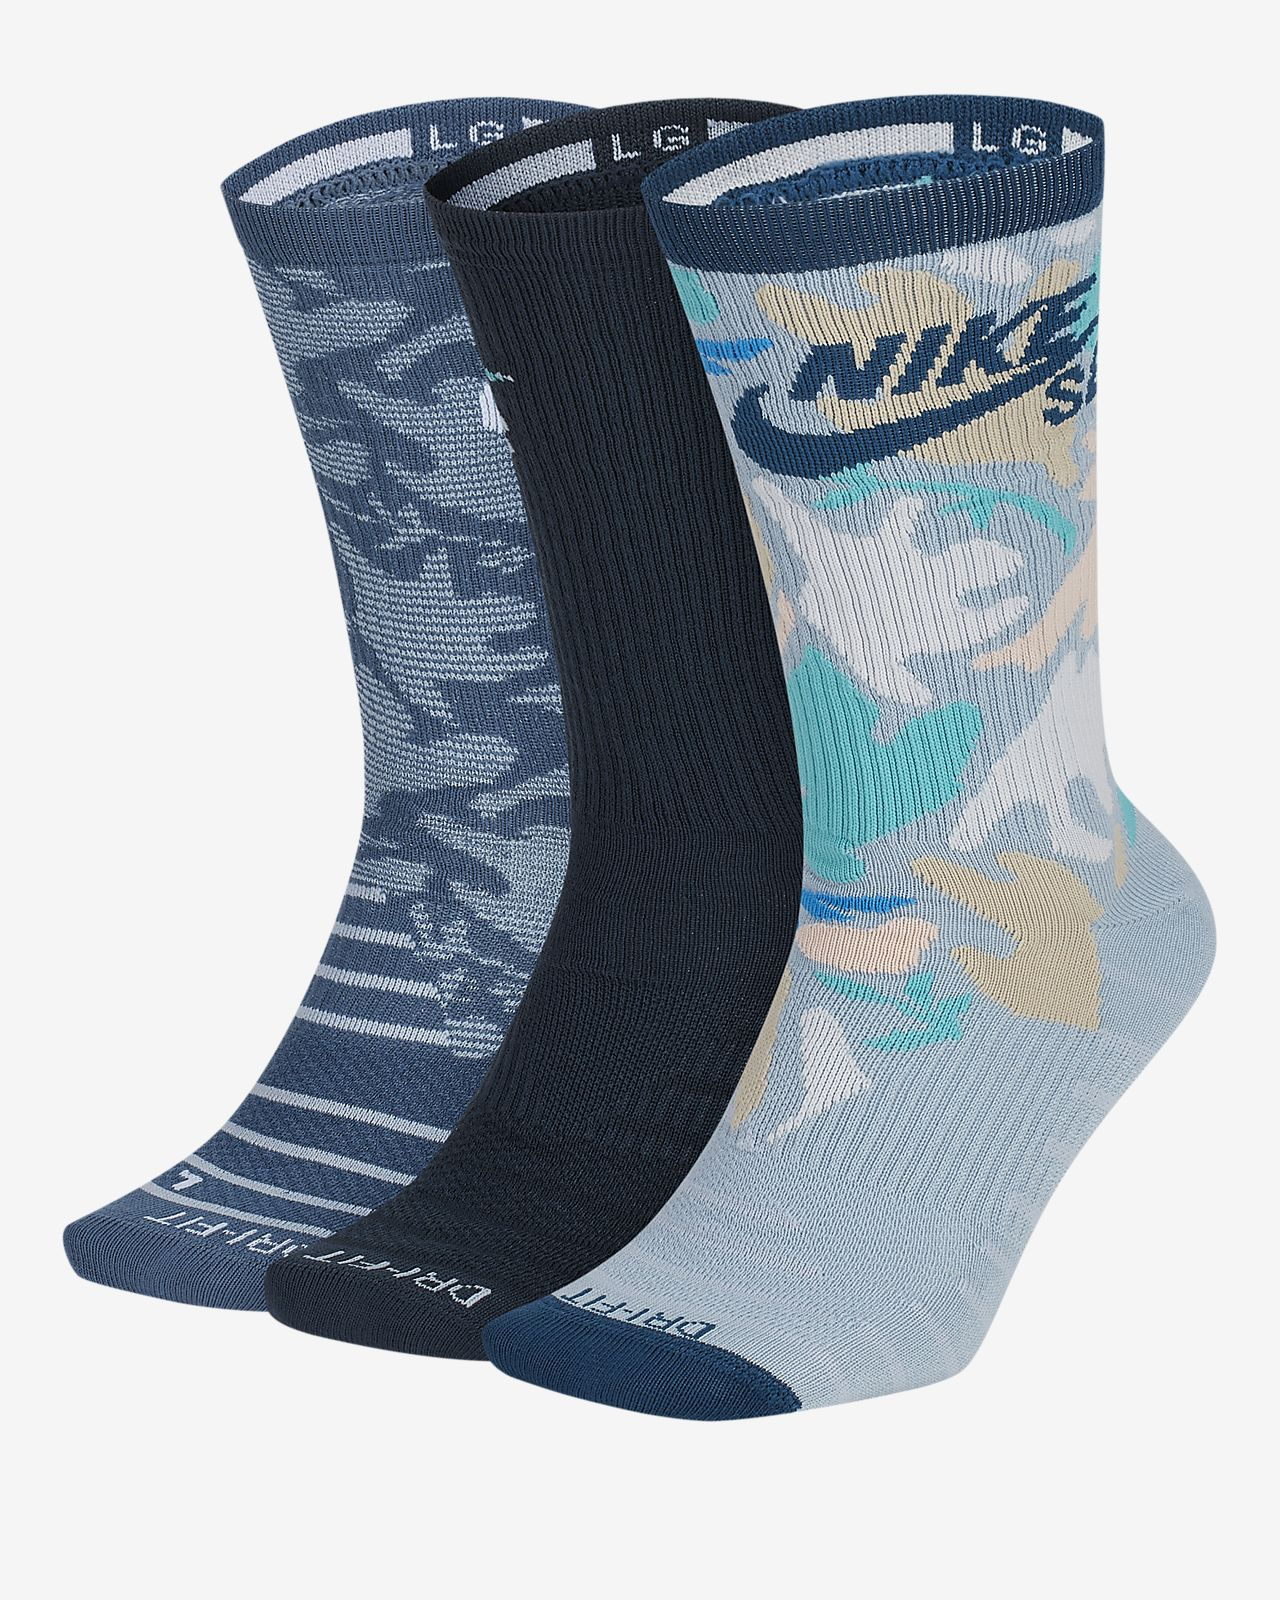 3a4e76ad4d24 Nike SB Everyday Max Lightweight Skate Crew Socks (3 Pairs). Nike.com AU